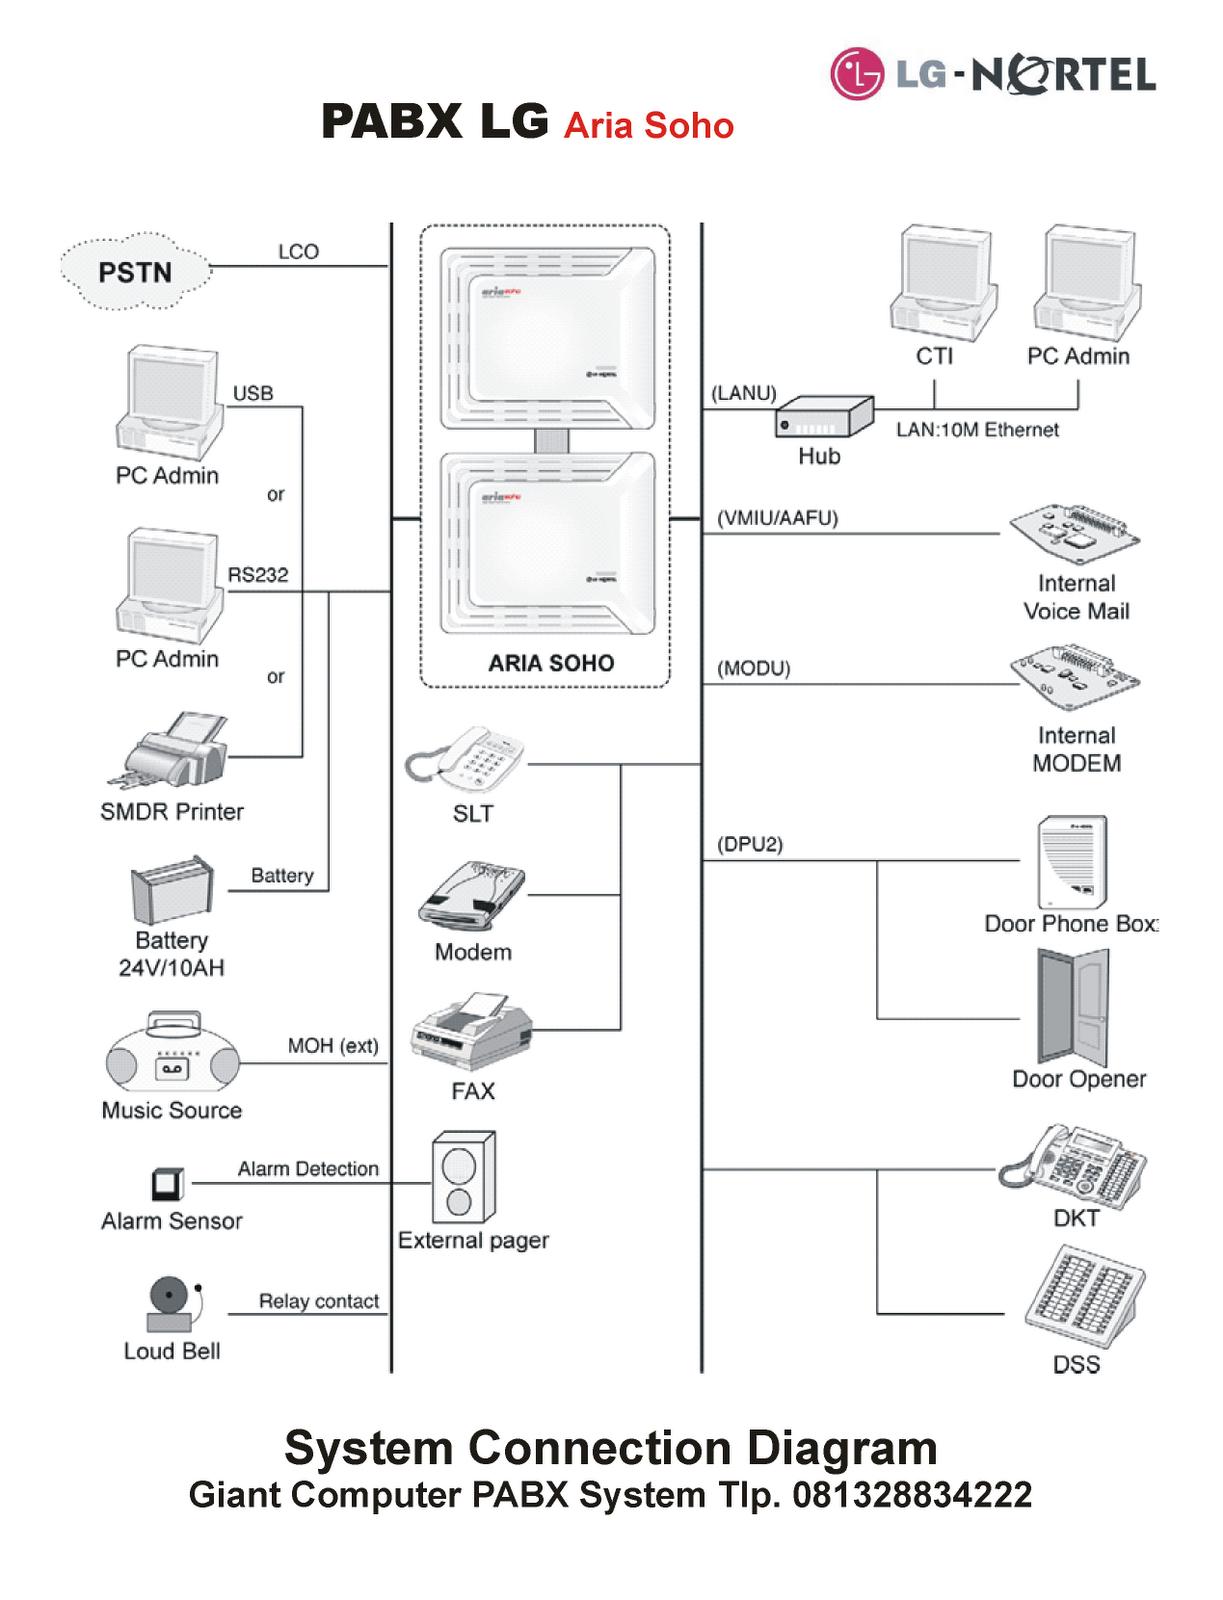 Pabx Lg Aria Soho  Diagram Instalasi Pabx Lg Aria Soho